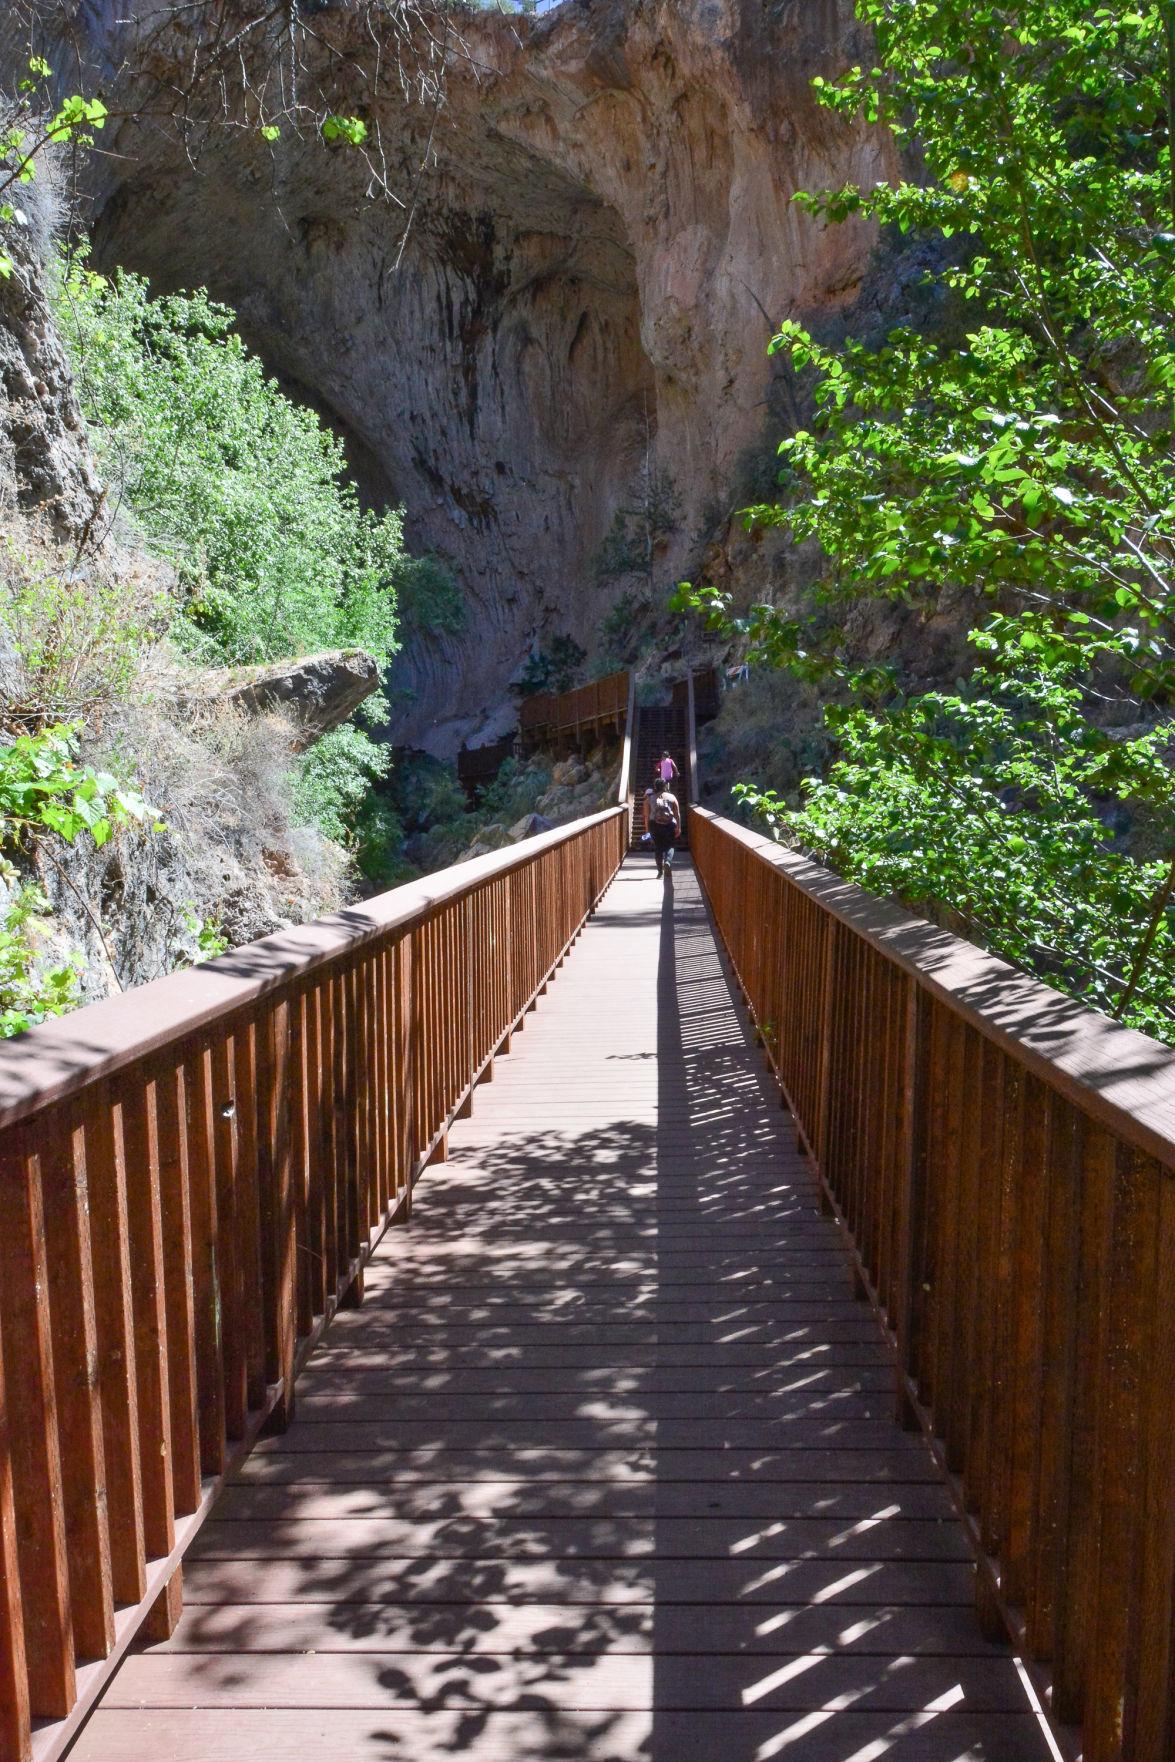 Tonto Natural Bridge New Walkway now needs replacing